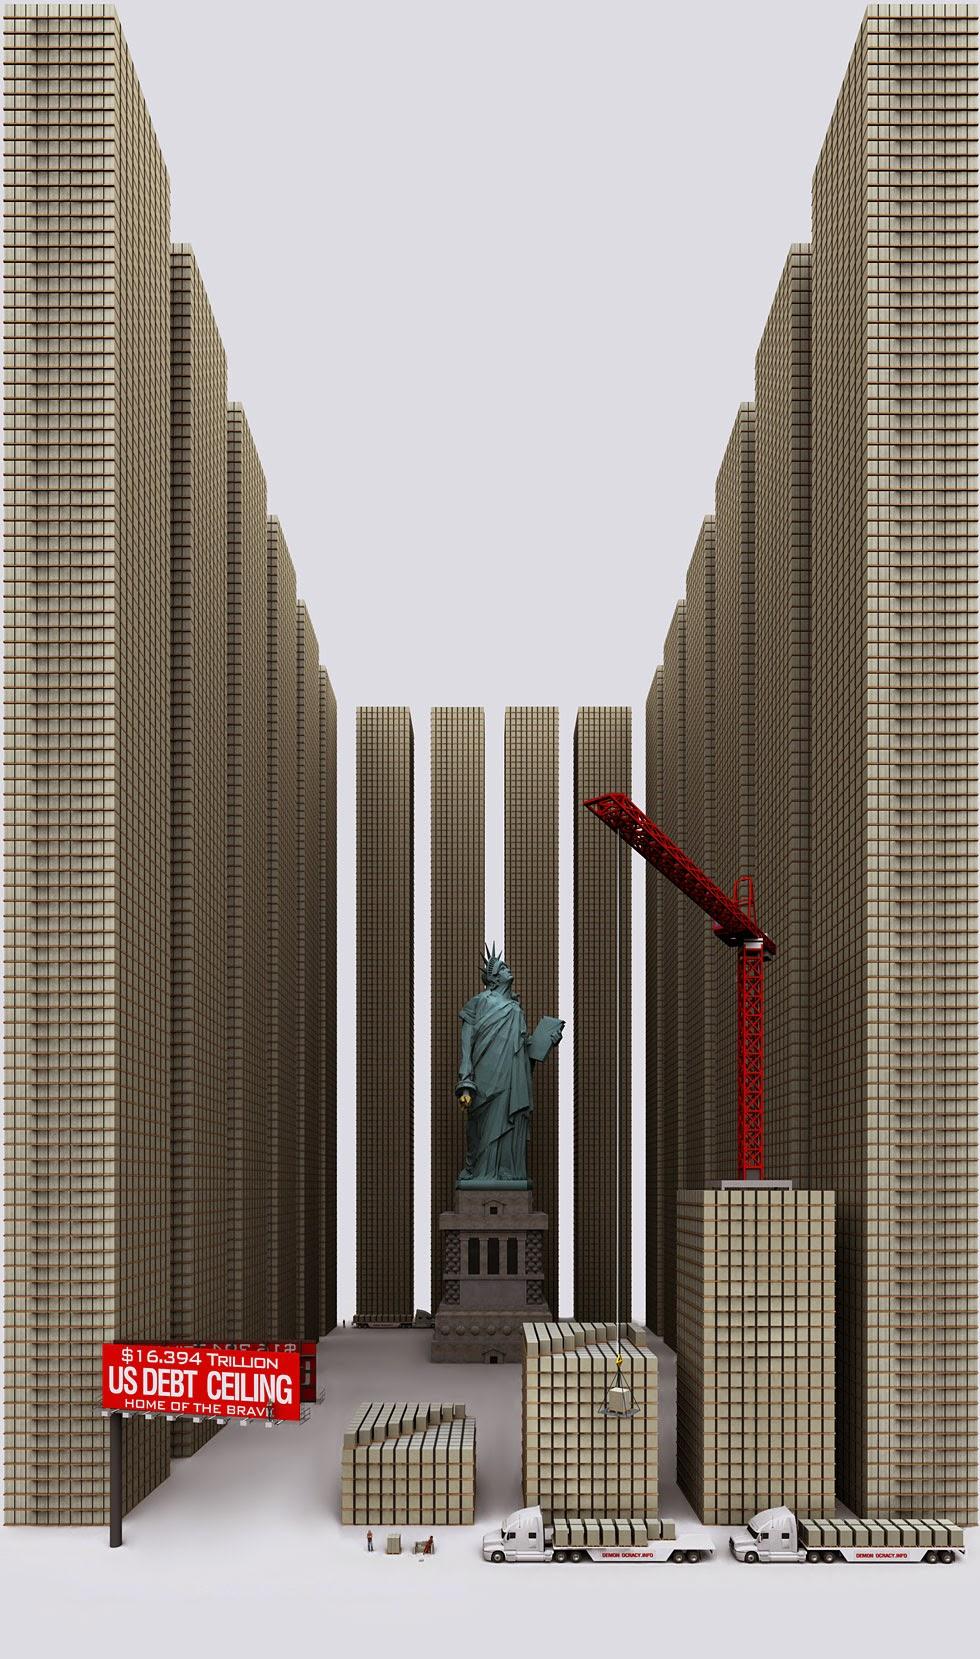 usd-us-debt_ceiling-2012-16394_billion_U